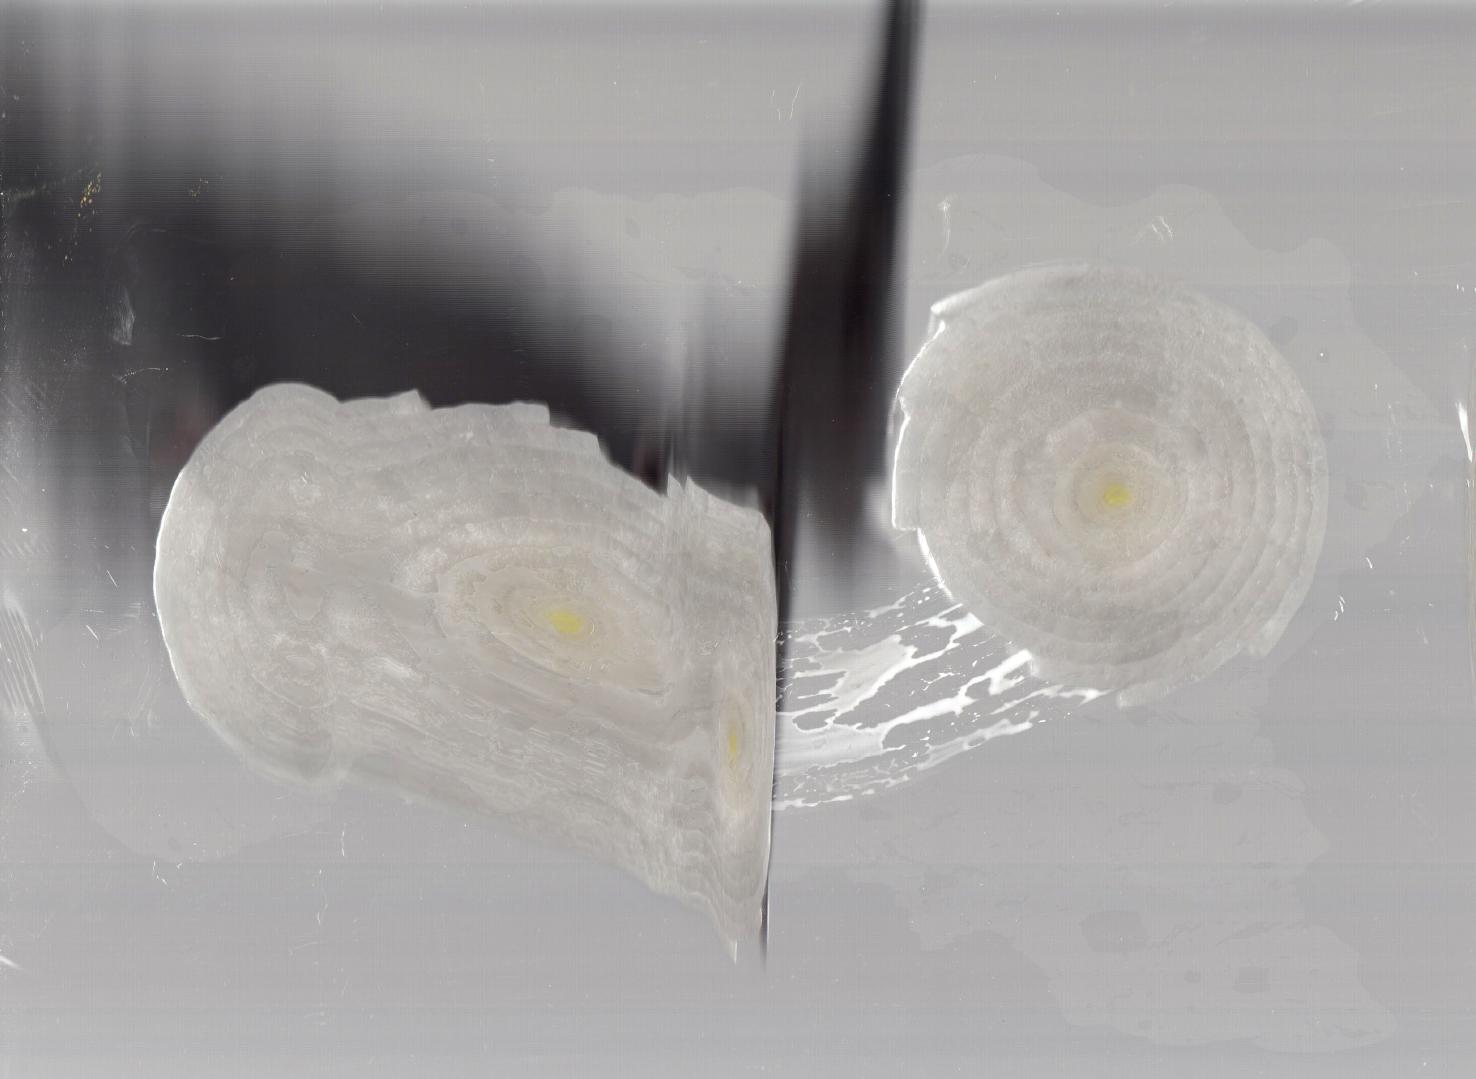 sara chaudhuri-onion scan